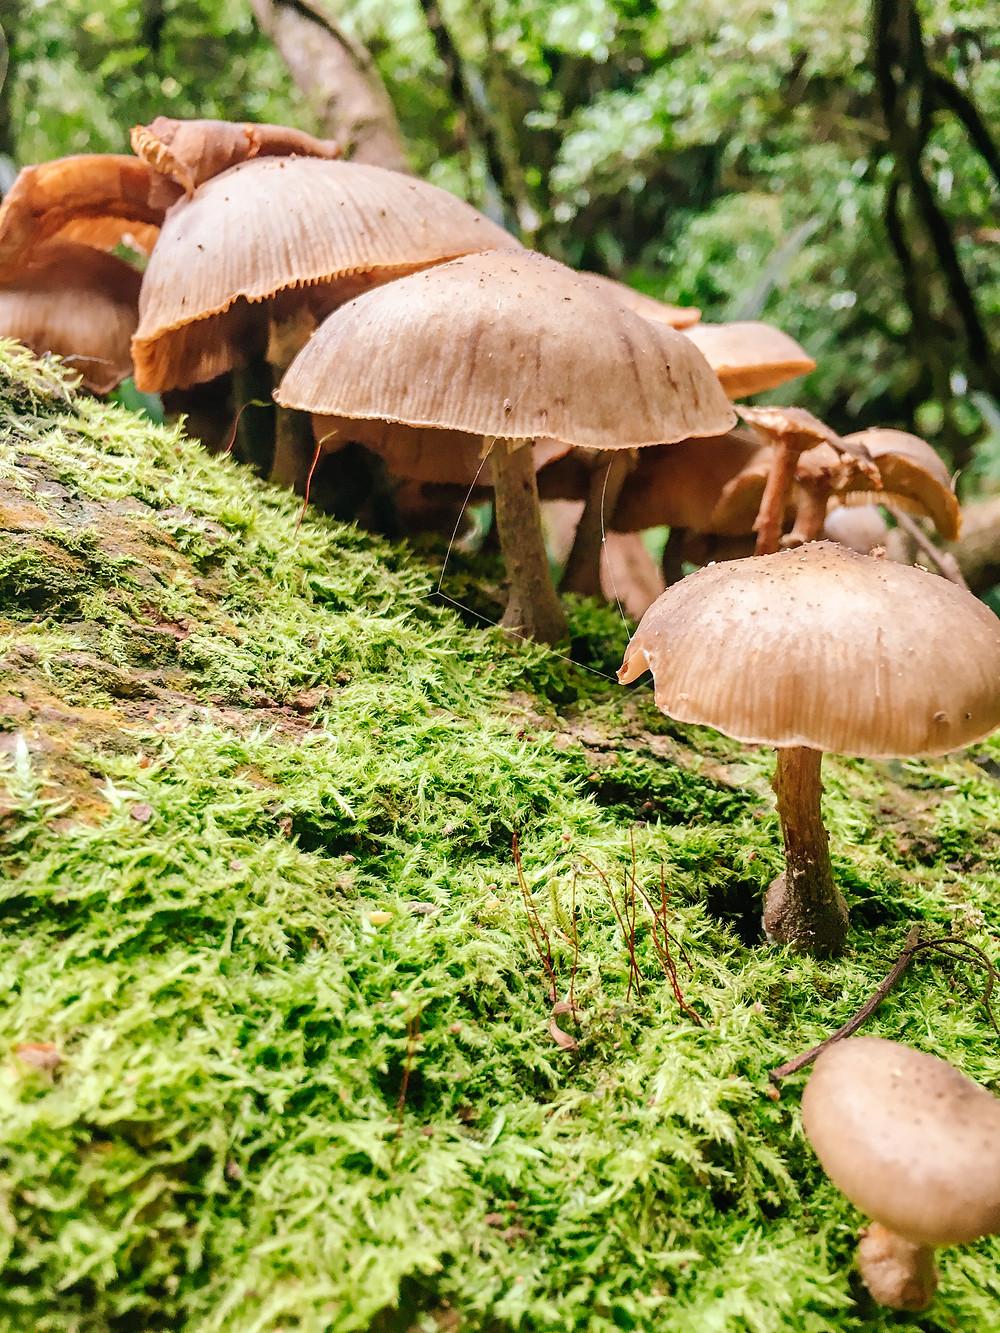 Wild Mushrooms Toolona Creek Falls Hike Lamington National Park